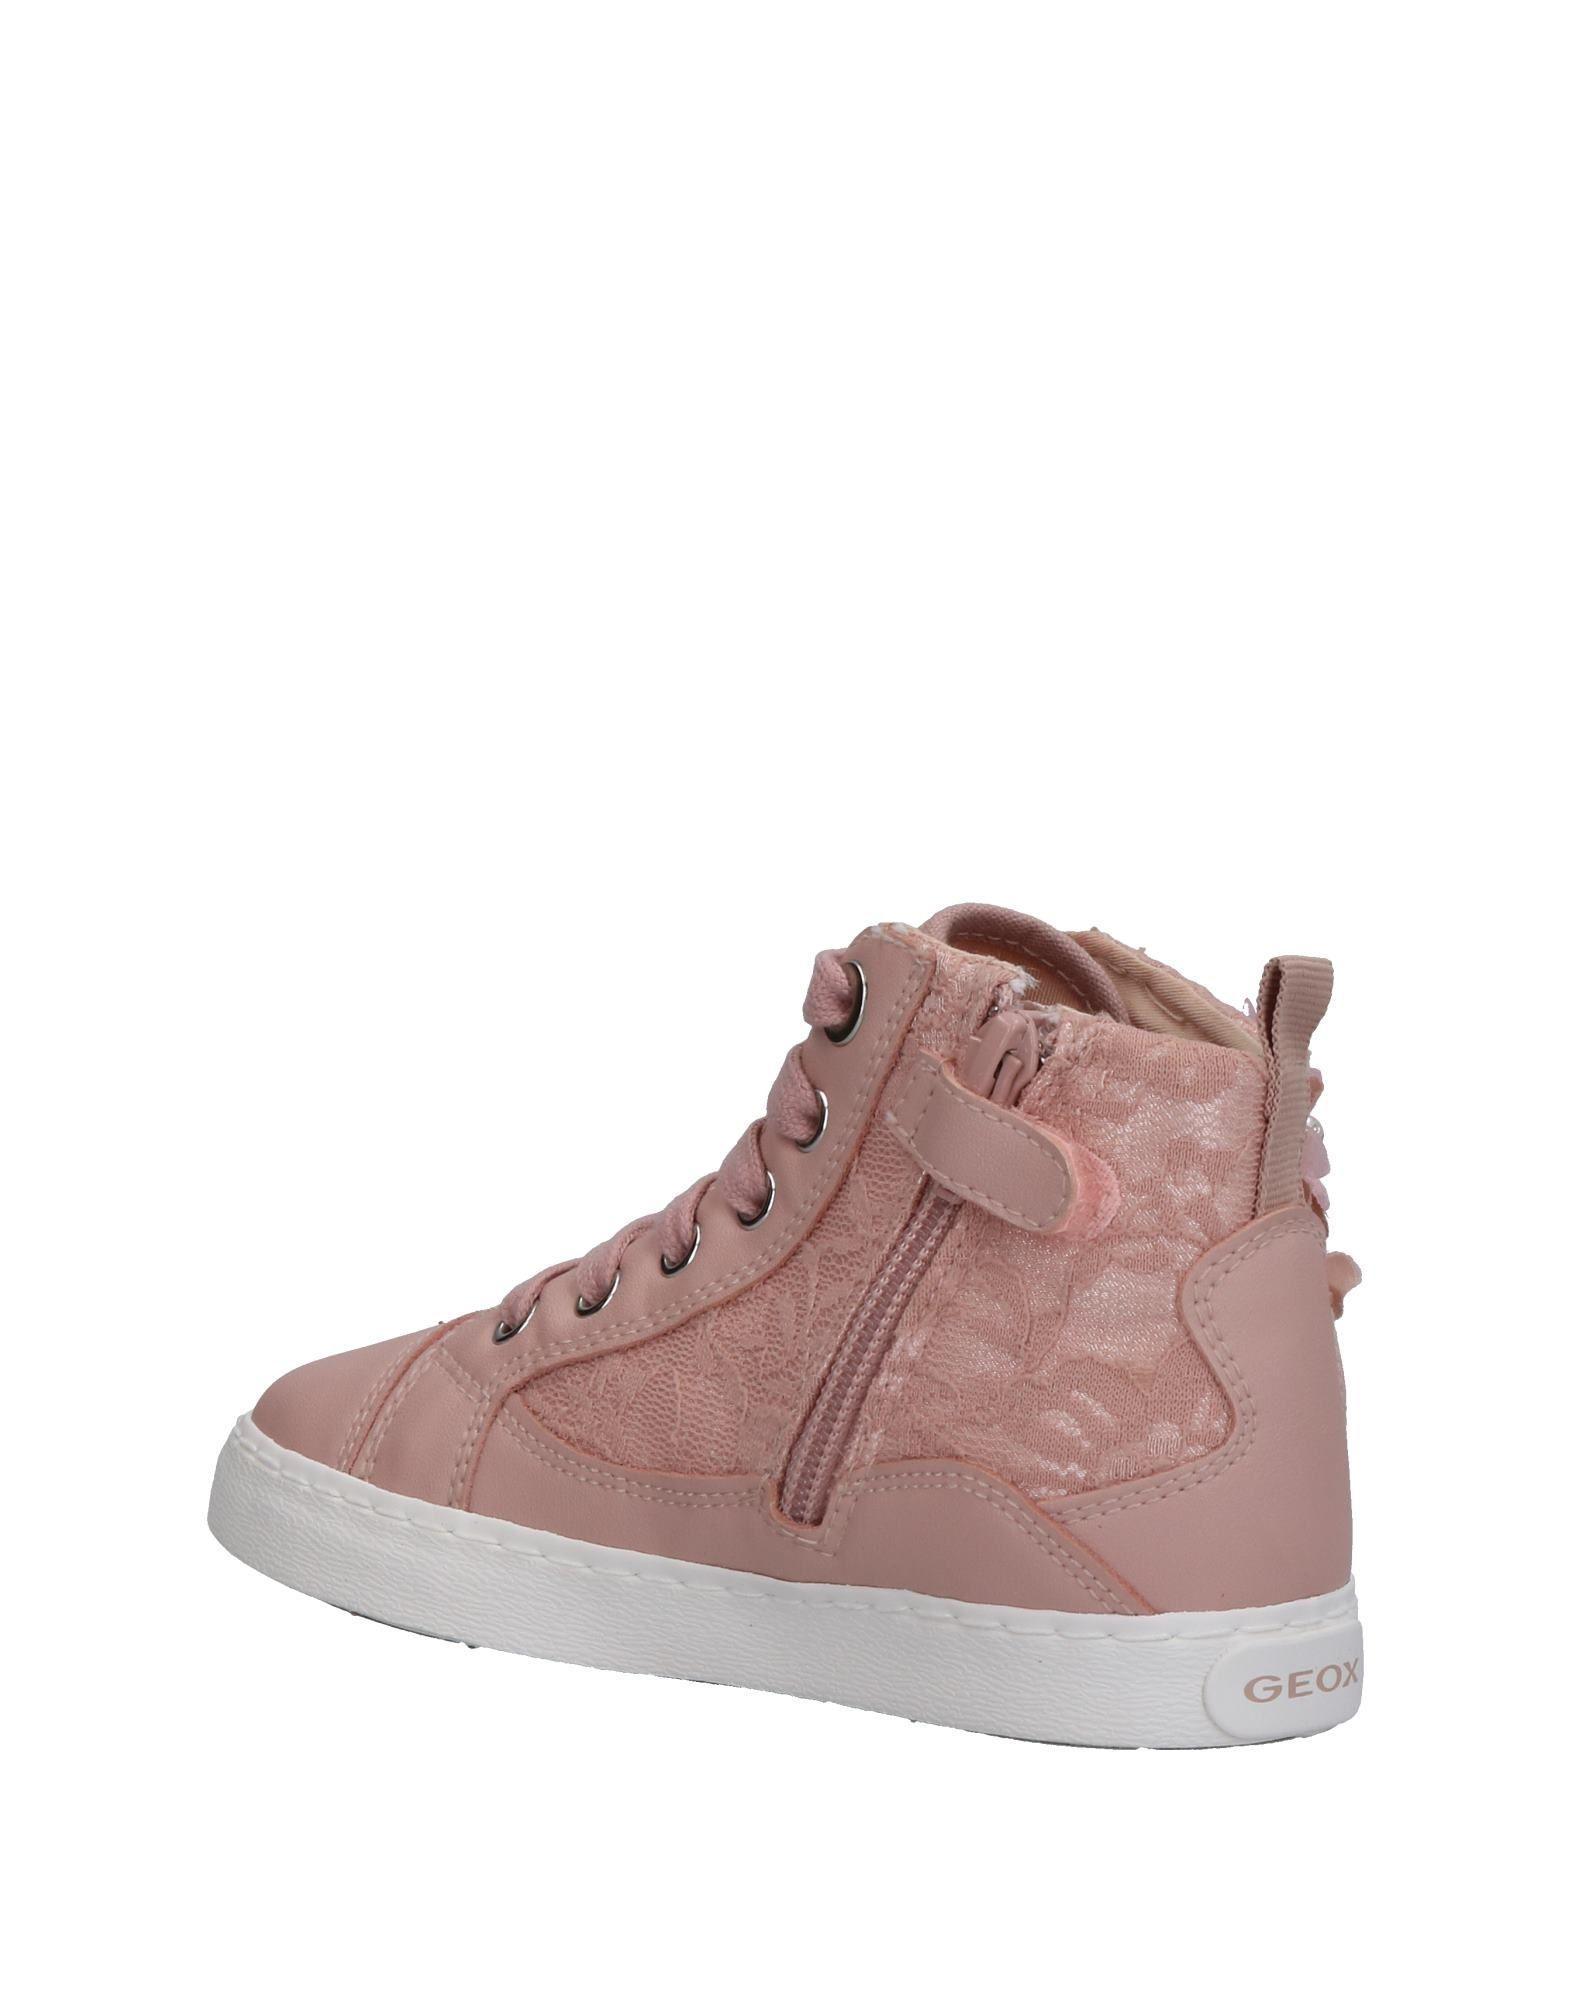 Geox High-tops & Sneakers in Pink